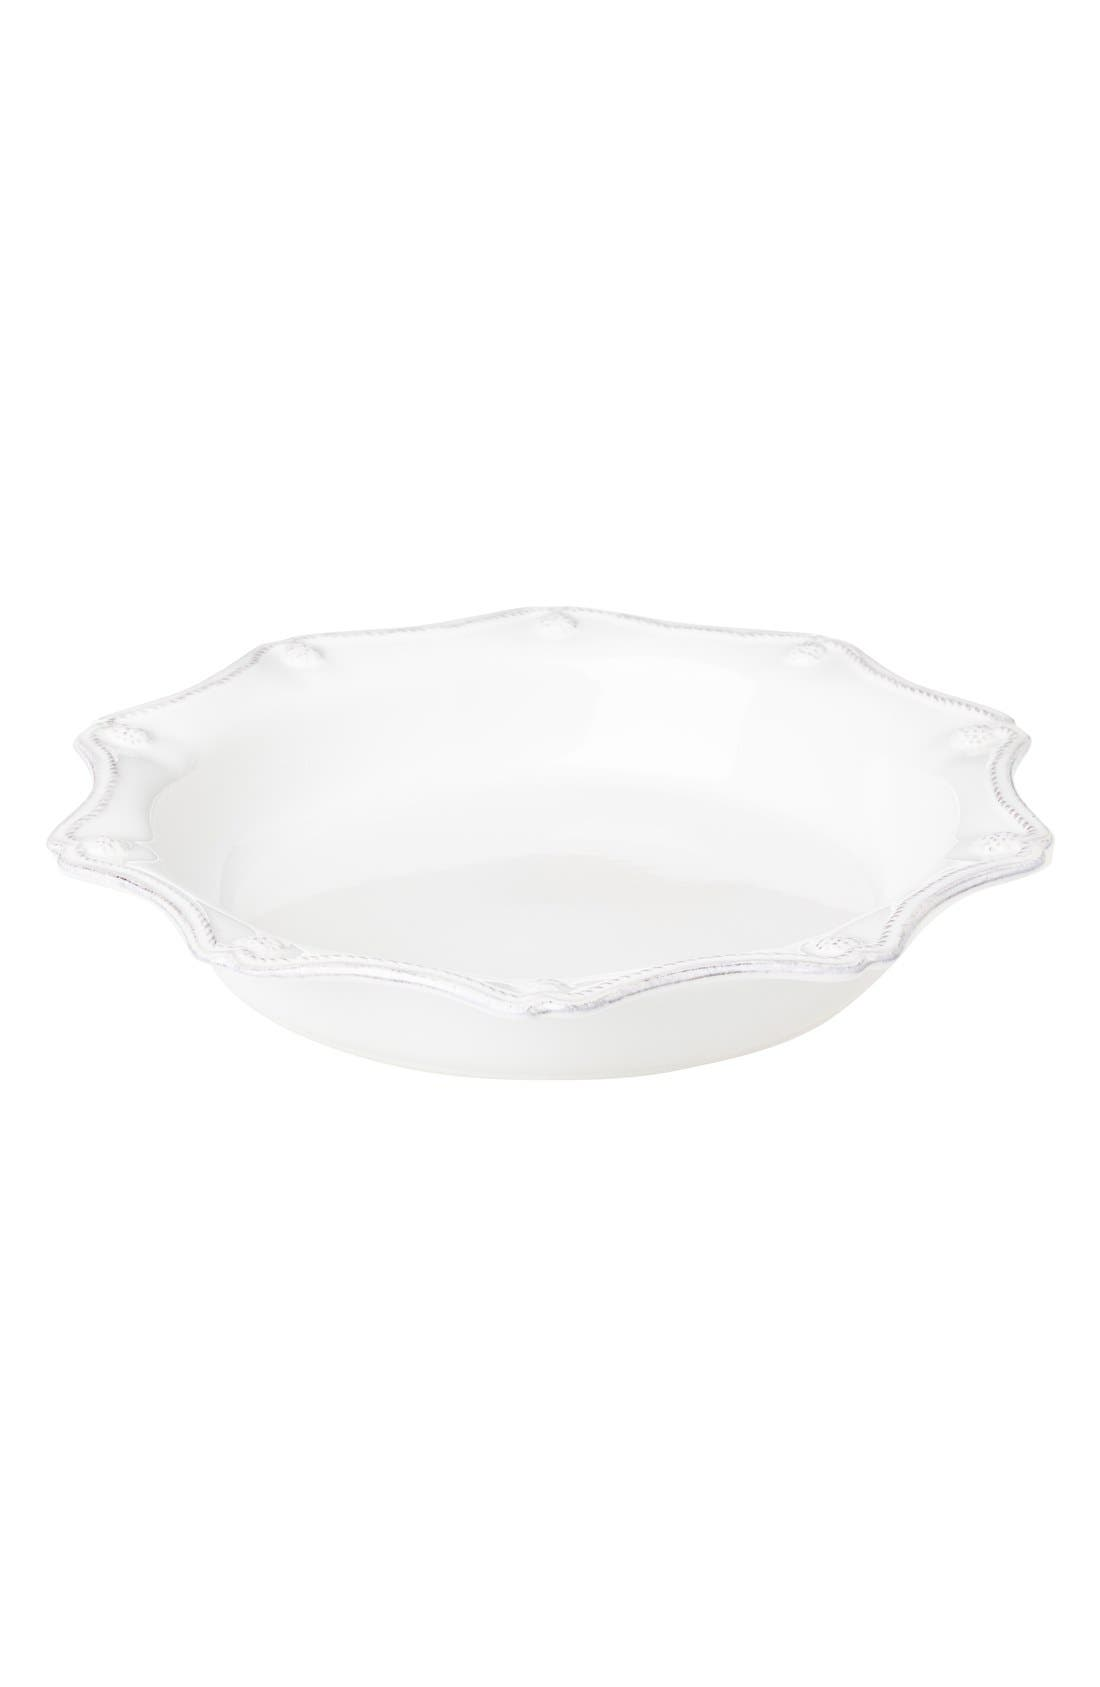 JULISKA 'Berry and Thread' Ceramic Pie Dish, Main, color, WHITEWASH